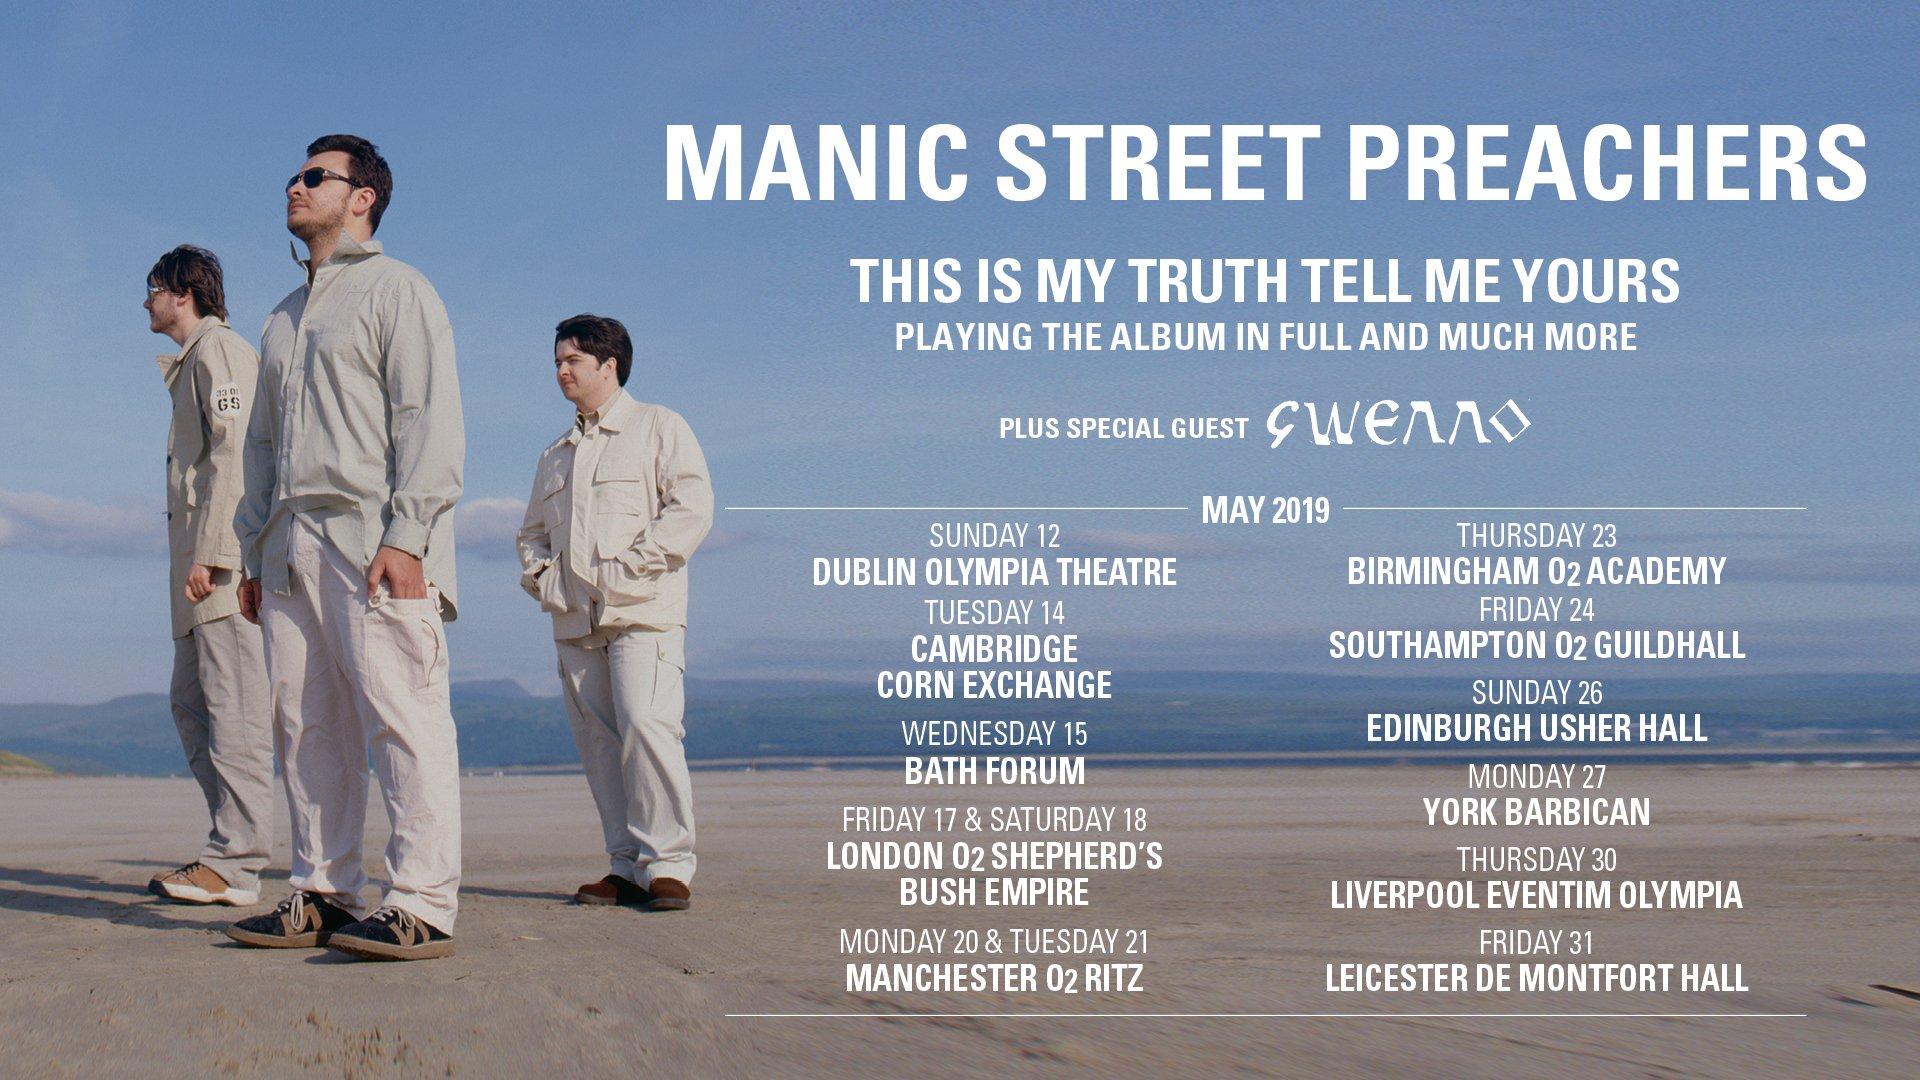 Manic Street Preachers 2019 UK tour.jpg